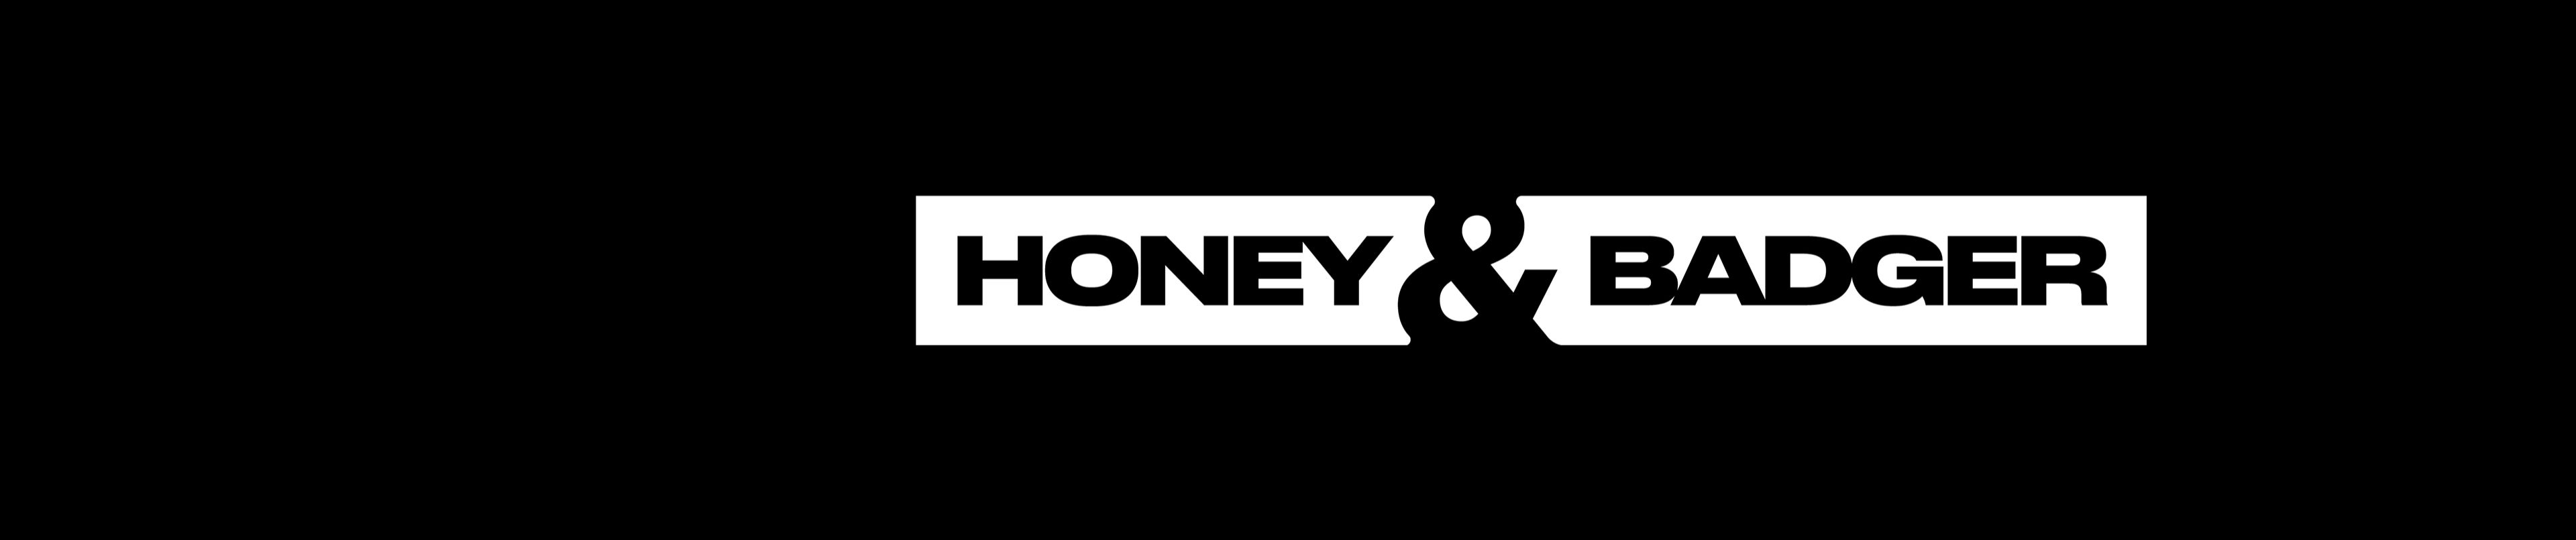 DJ Falcon & Thomas Bangalter - Together (Honey & Badger 2020 Vision) by  Honey & Badger